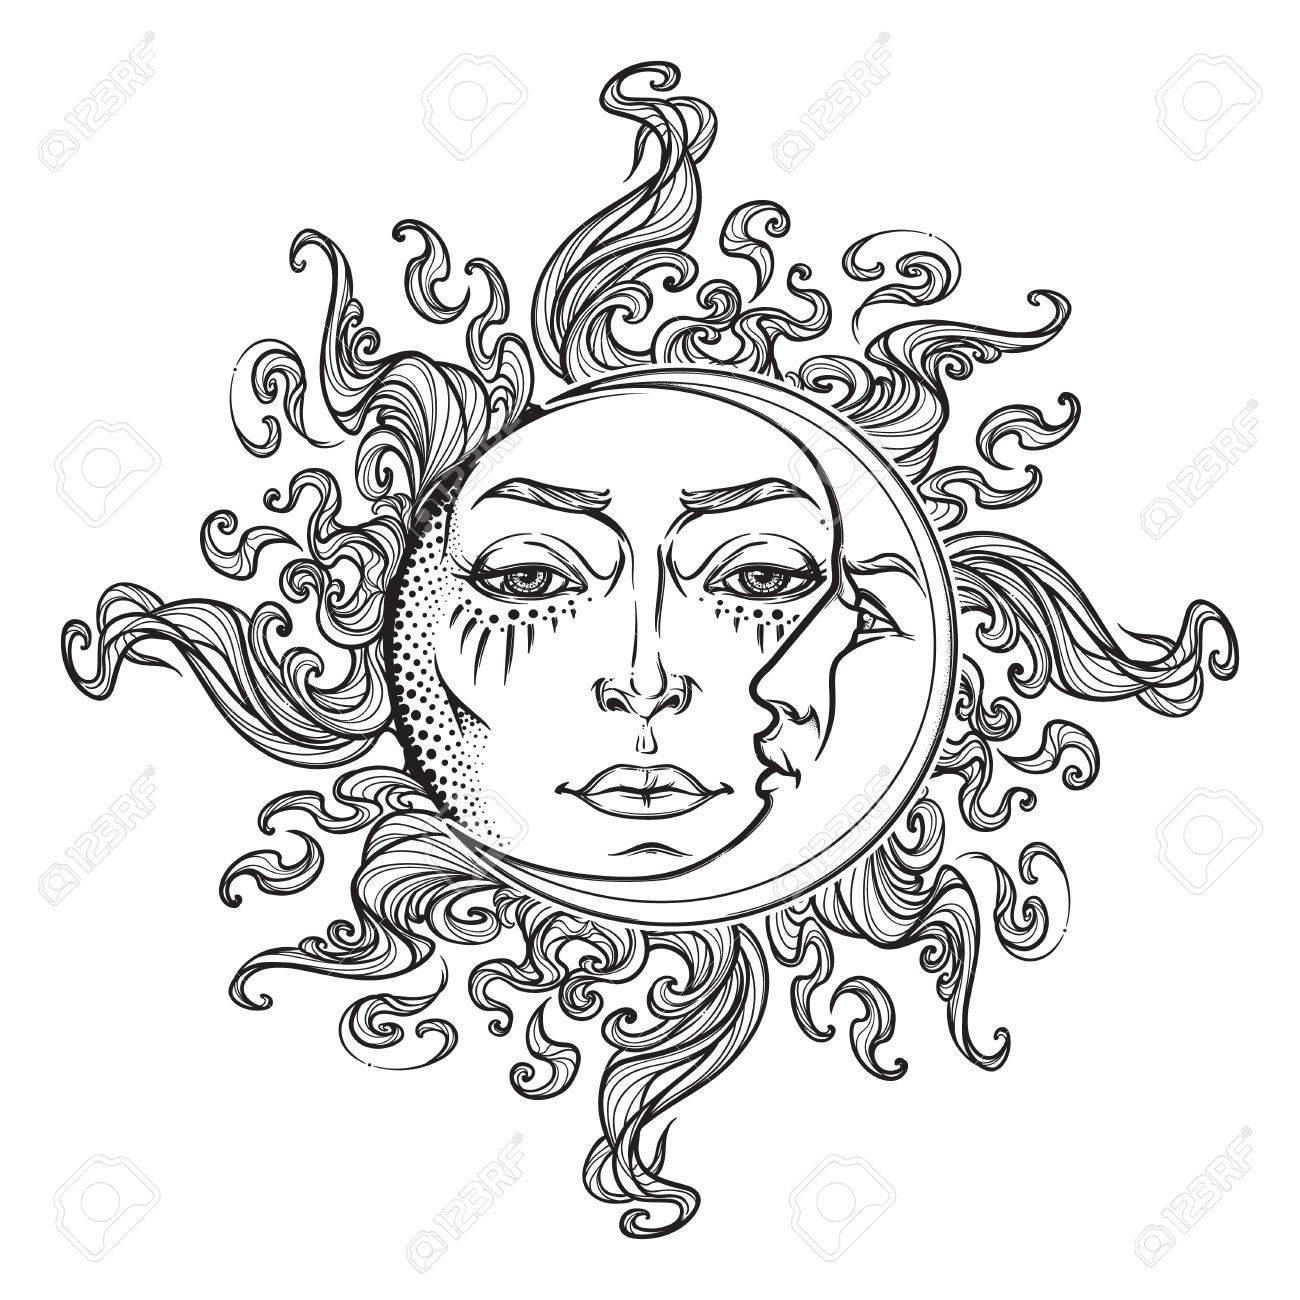 1300x1300 Drawn Sun Black And White